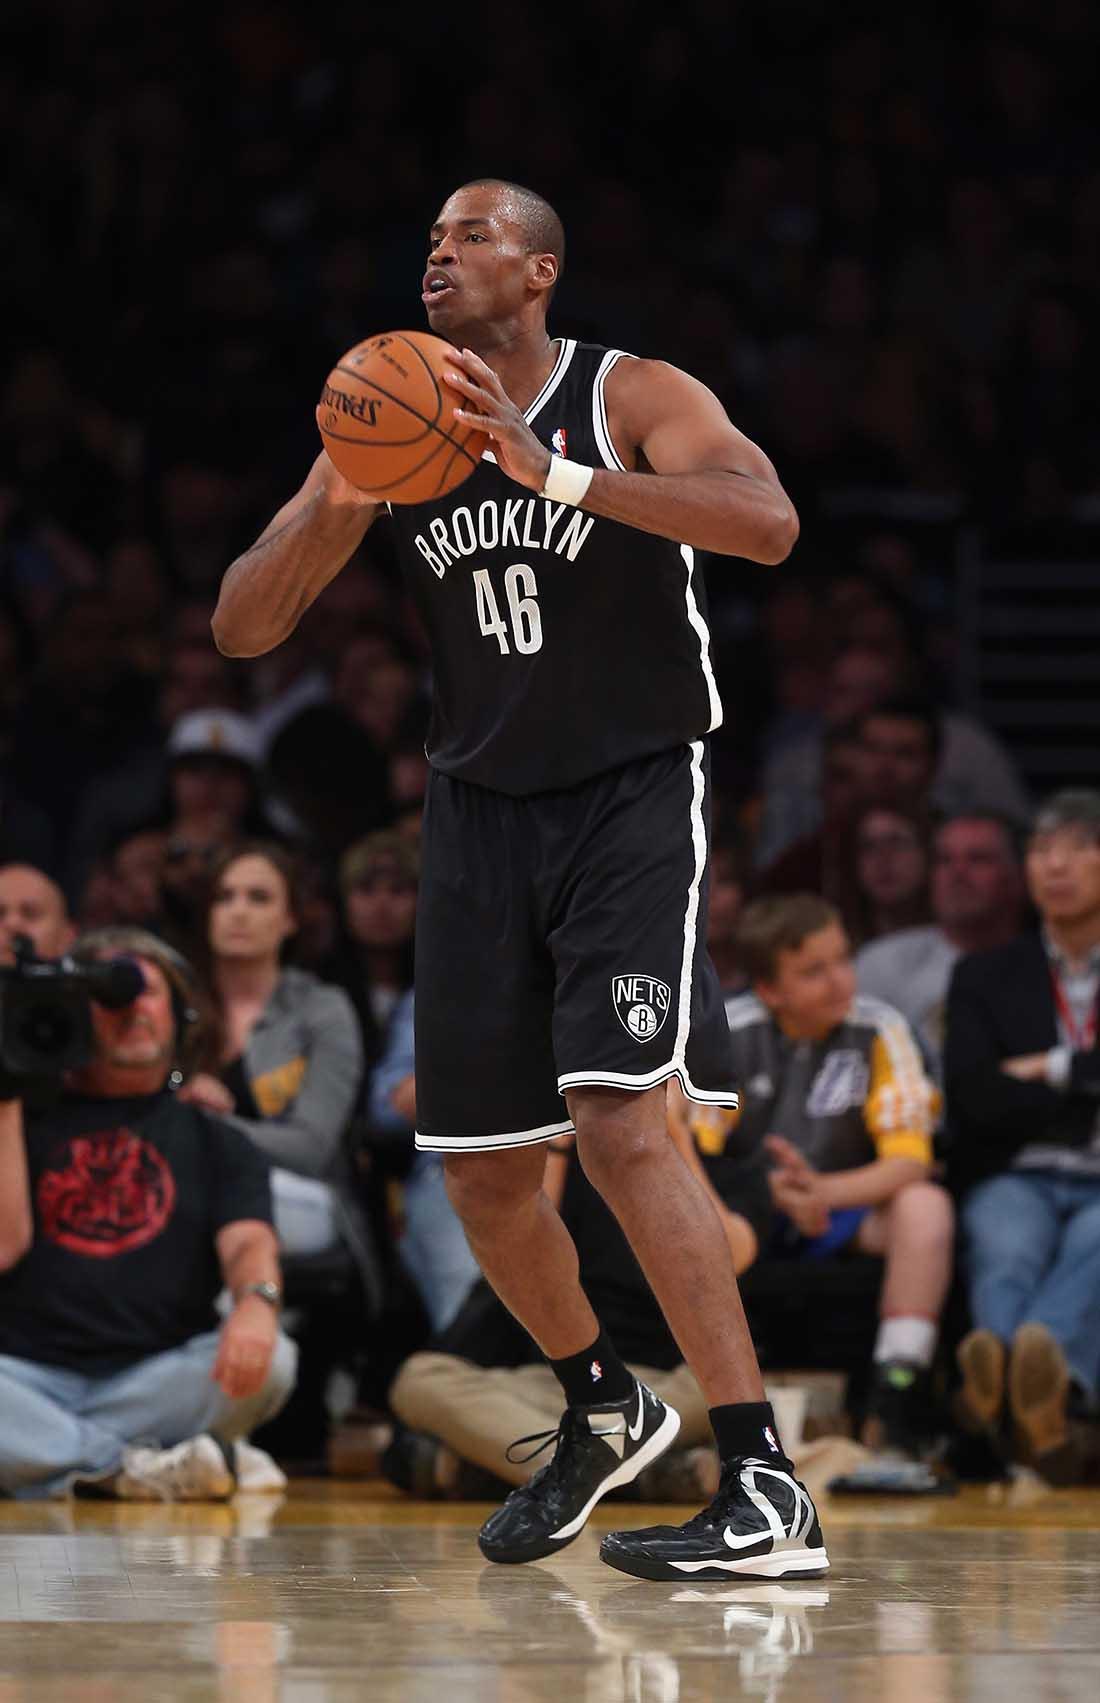 Brooklyn Nets v Los Angeles Lakers, Jason Collins en viva basquet